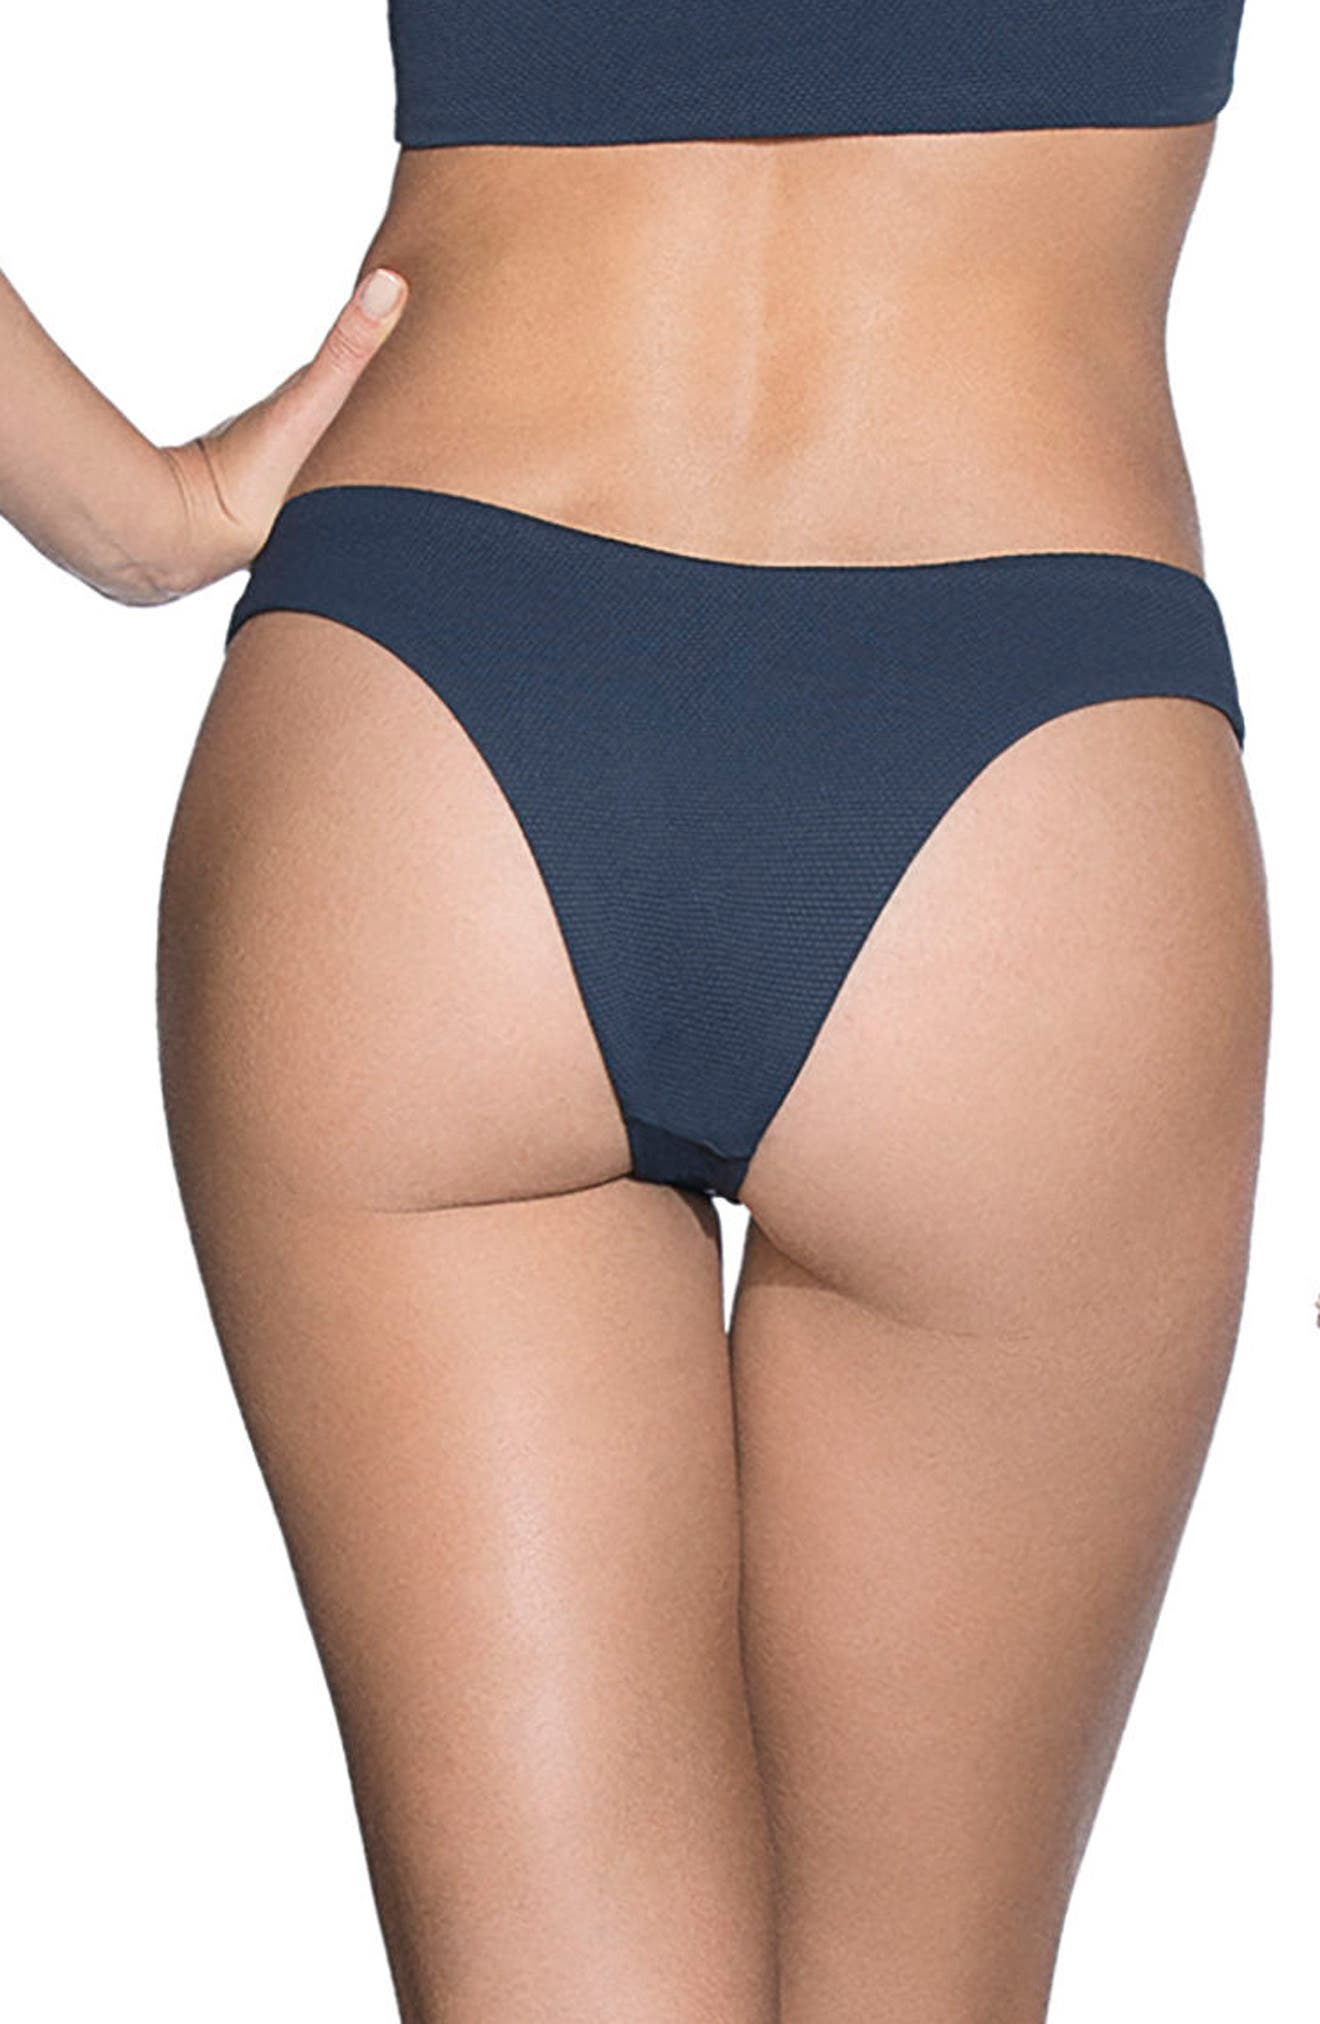 Alternate Image 1 Selected - Maaji Stargazer Reversible Cheeky Bikini Bottoms